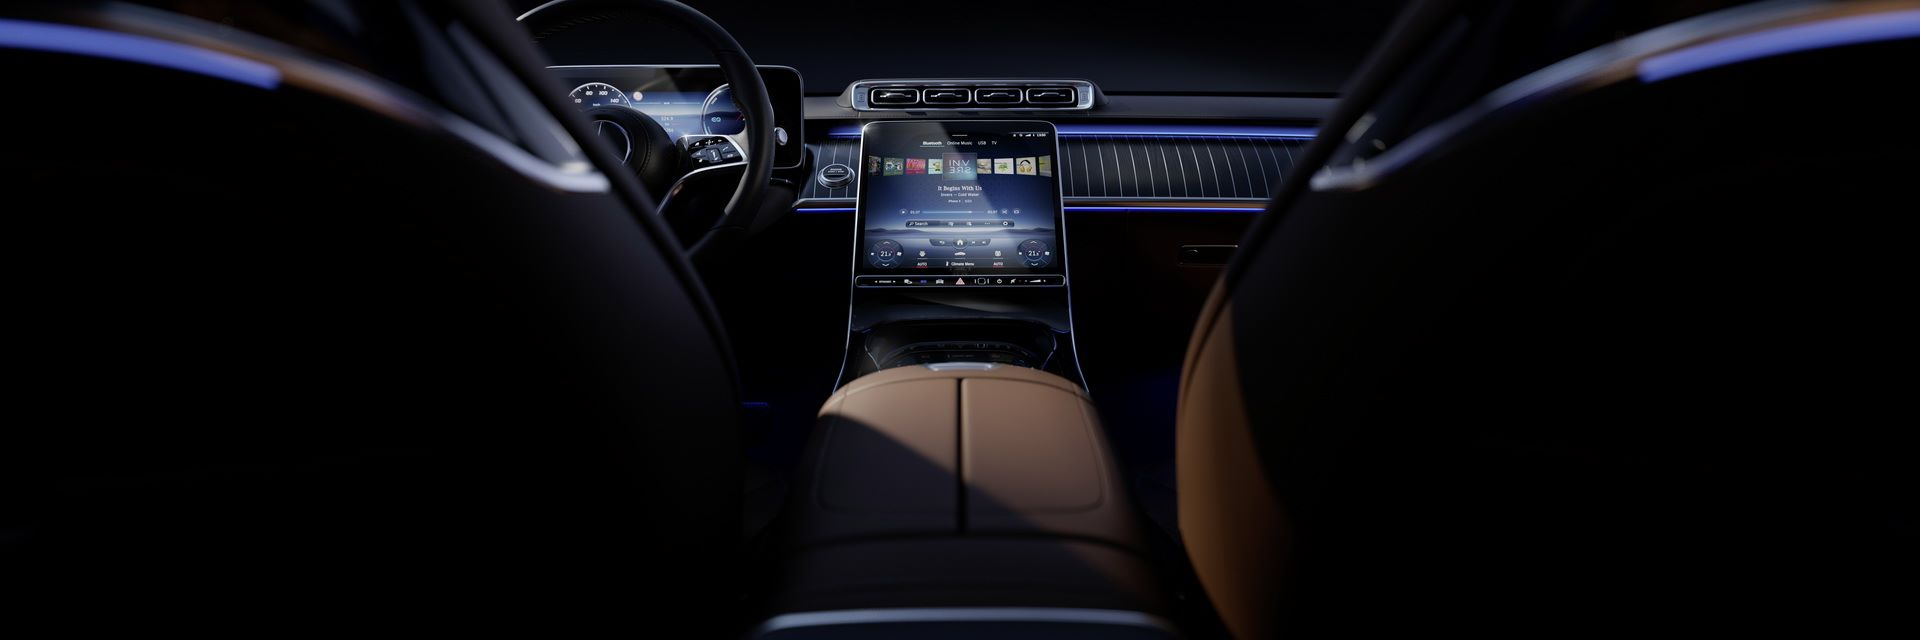 Mercedes-S-Class-2021-Interior-12